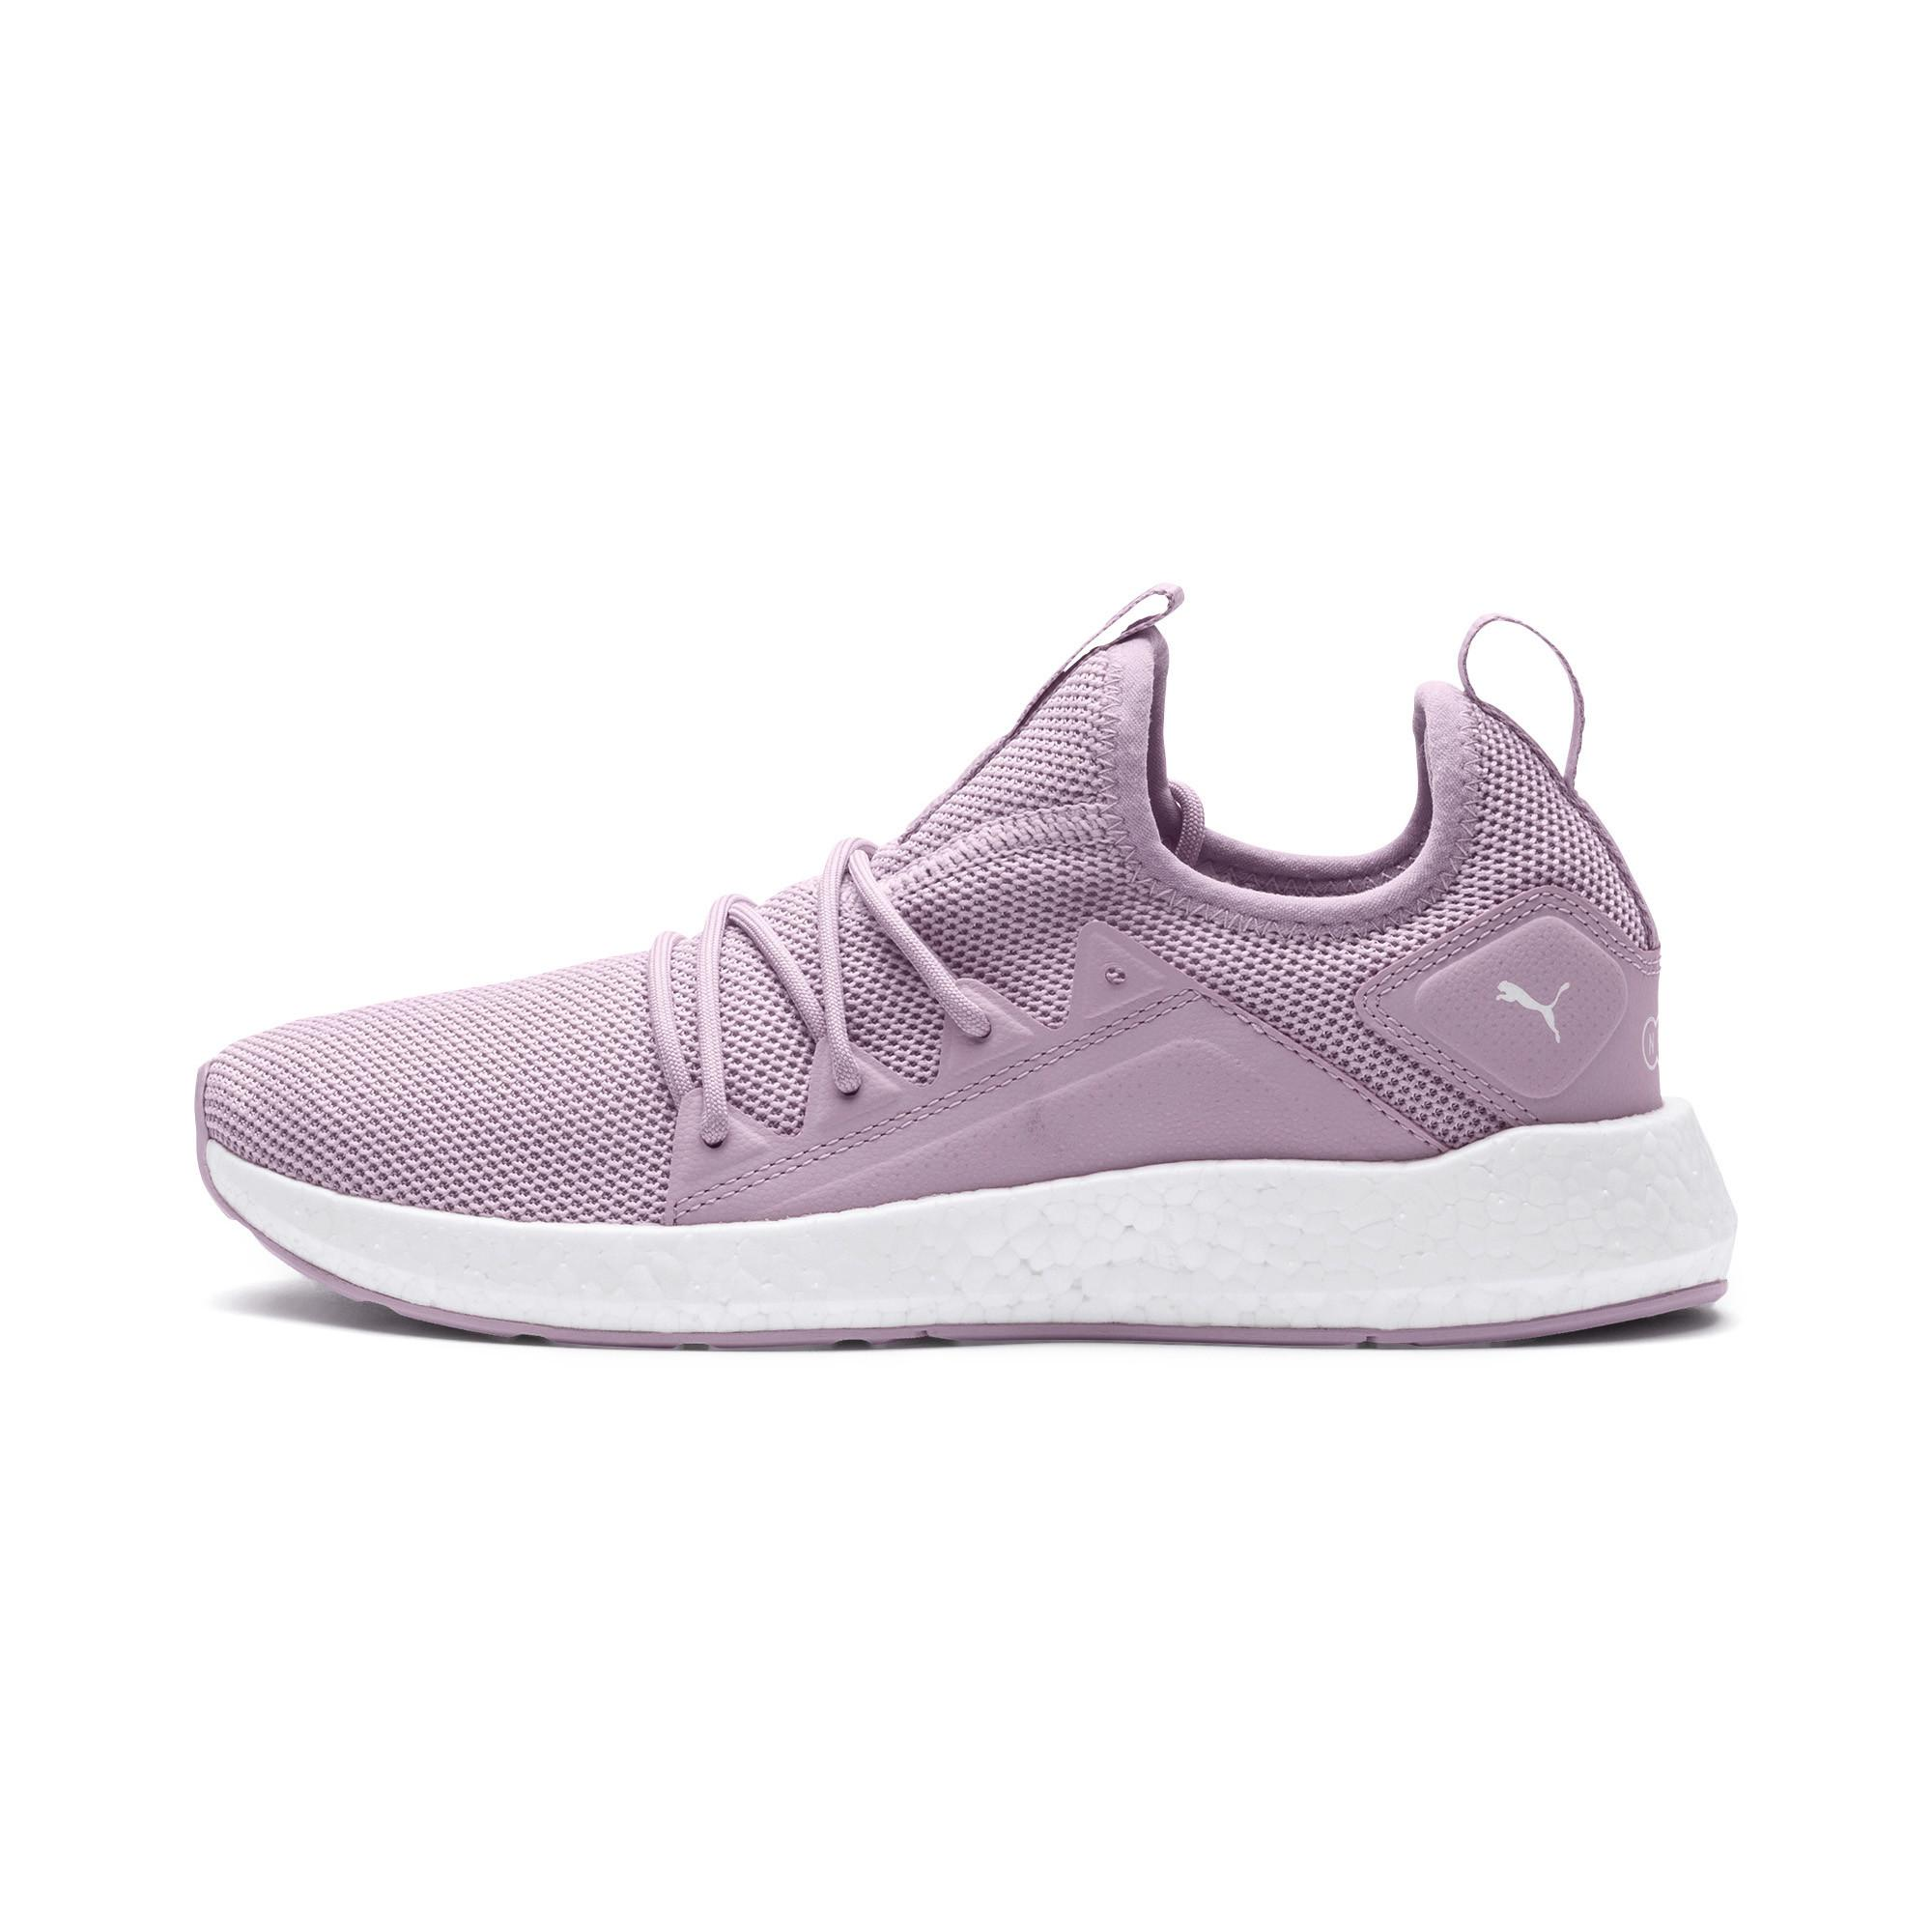 Lyst - PUMA Nrgy Neko Women s Sneakers in Purple d1a0bc41f